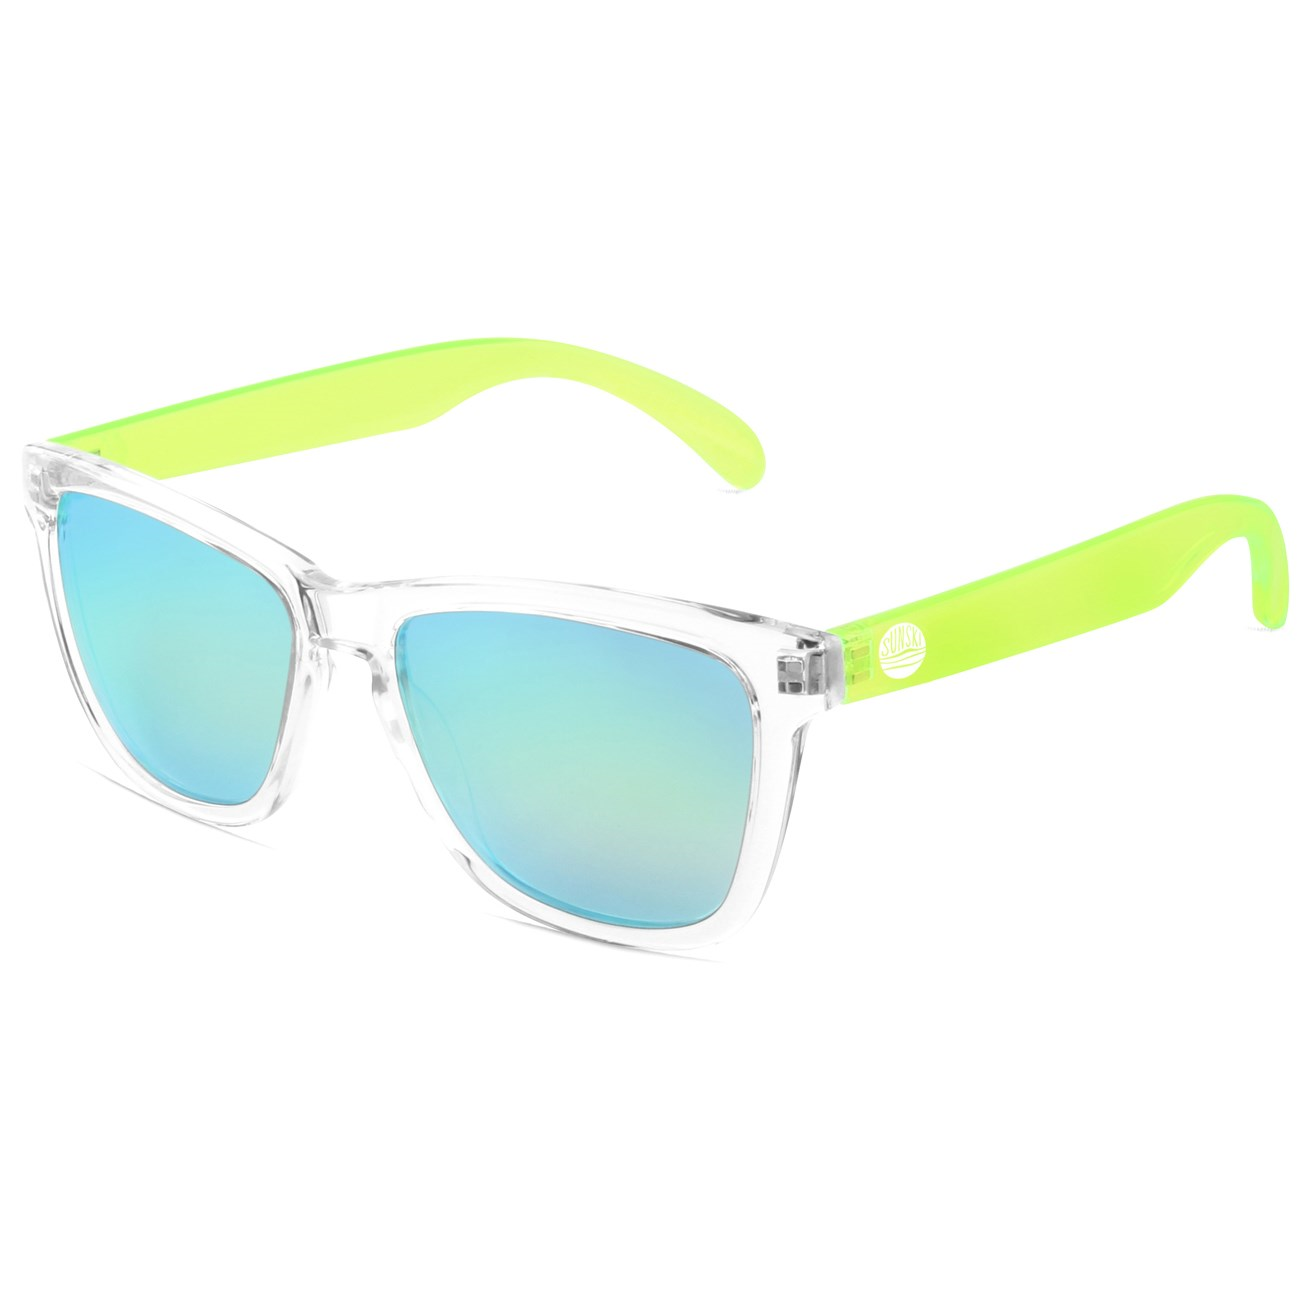 SUNSKI - Γυαλιά ηλίου SUNSKI διάφανα-lime